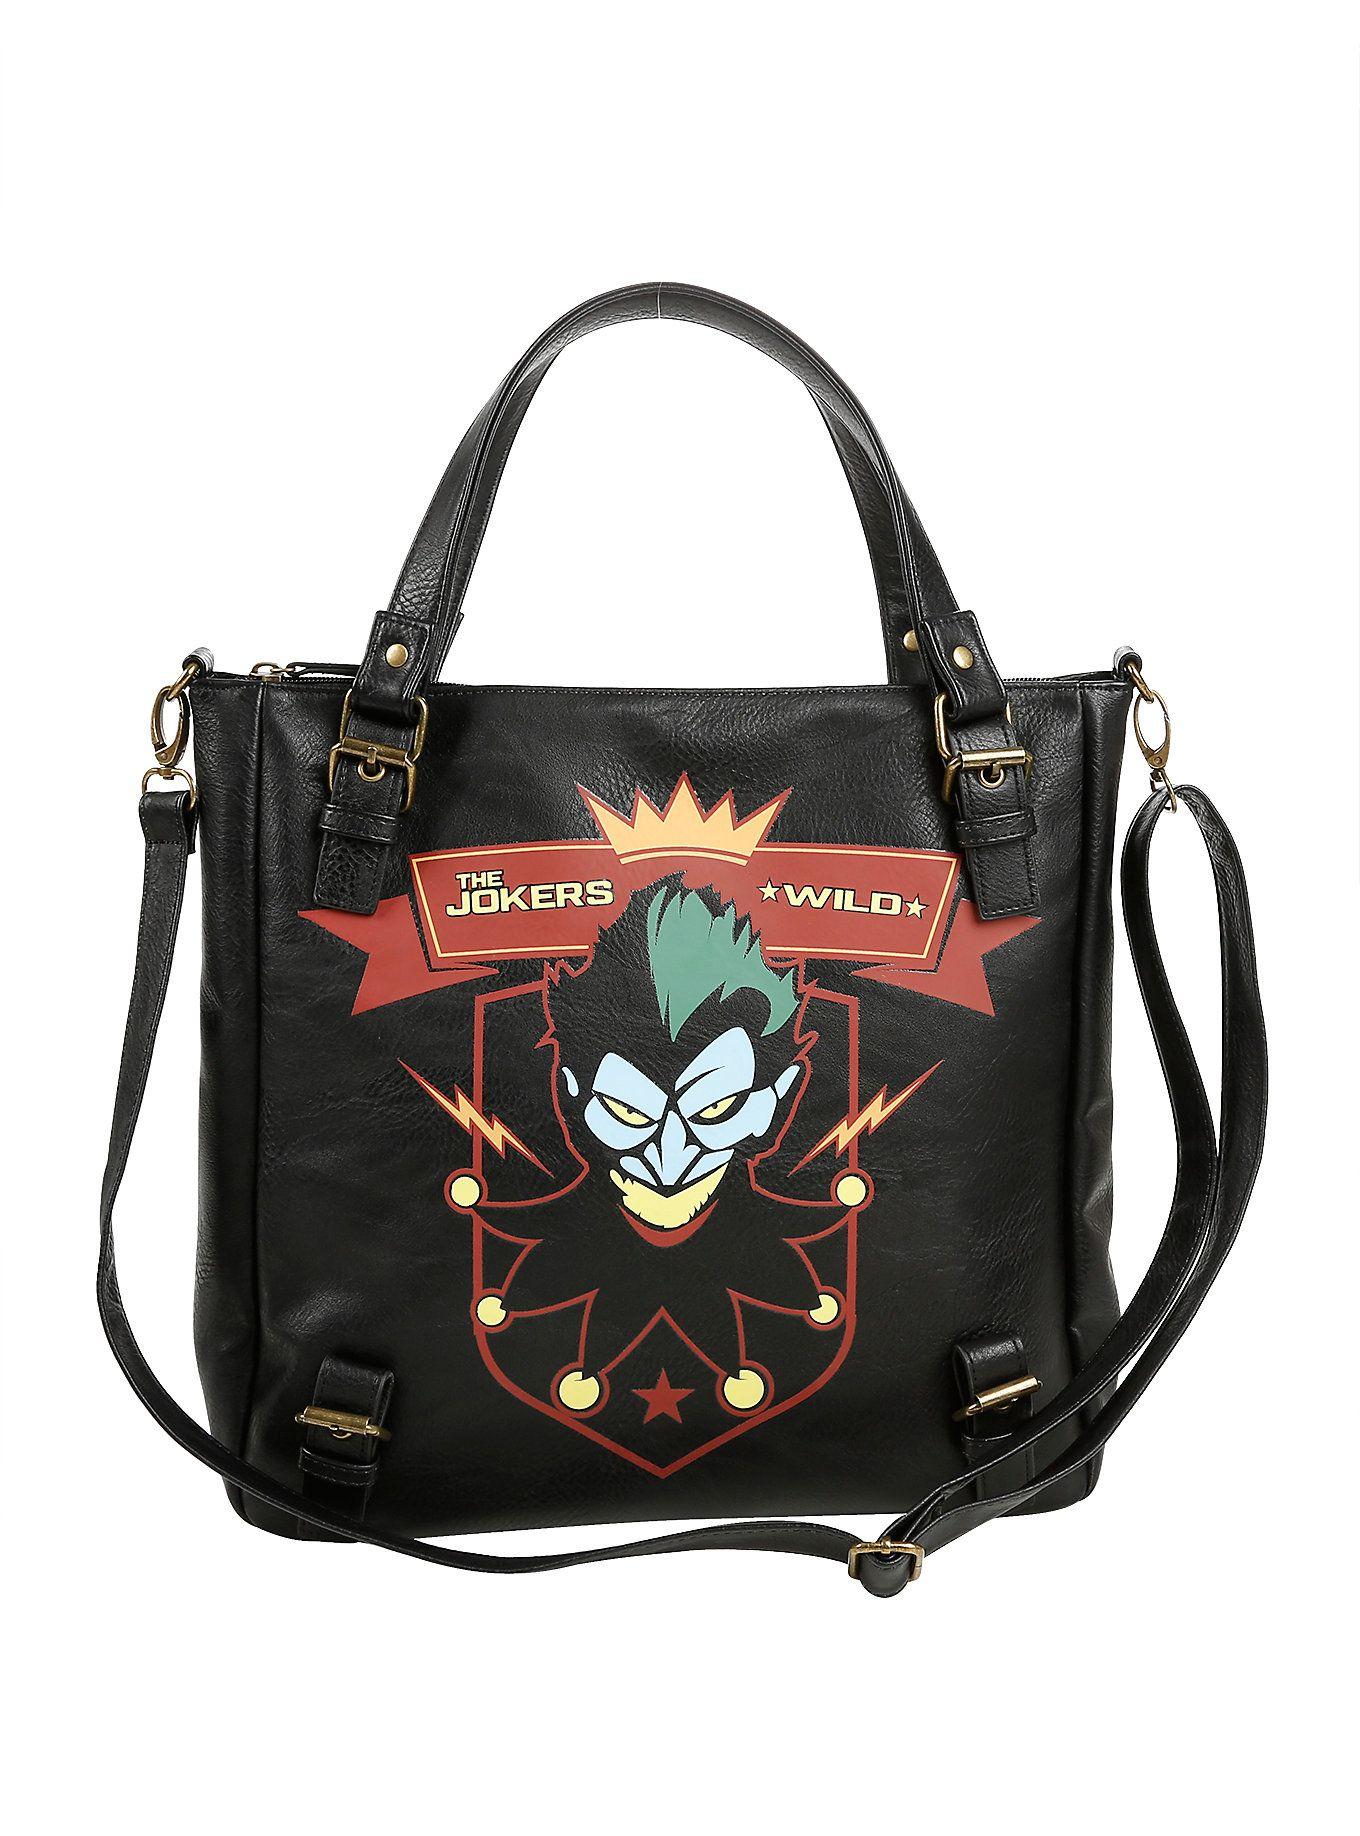 0b5ba7b2fd 10534850_av1 Black Leather Bags, Leather Handbags, Real Leather, Leather  Purses, Leather Shoulder